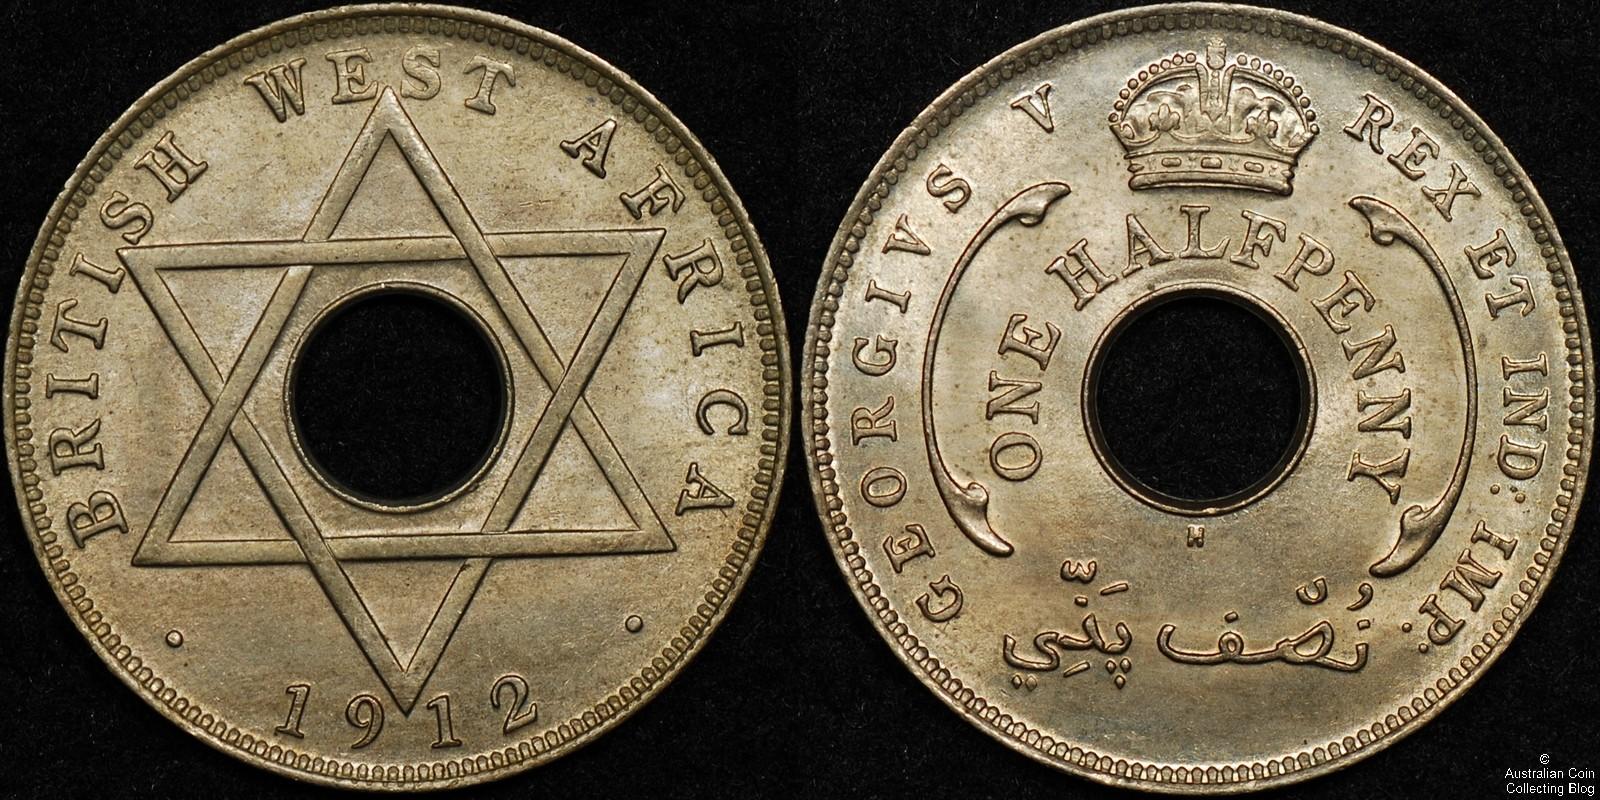 British West Africa 1912 1/2d